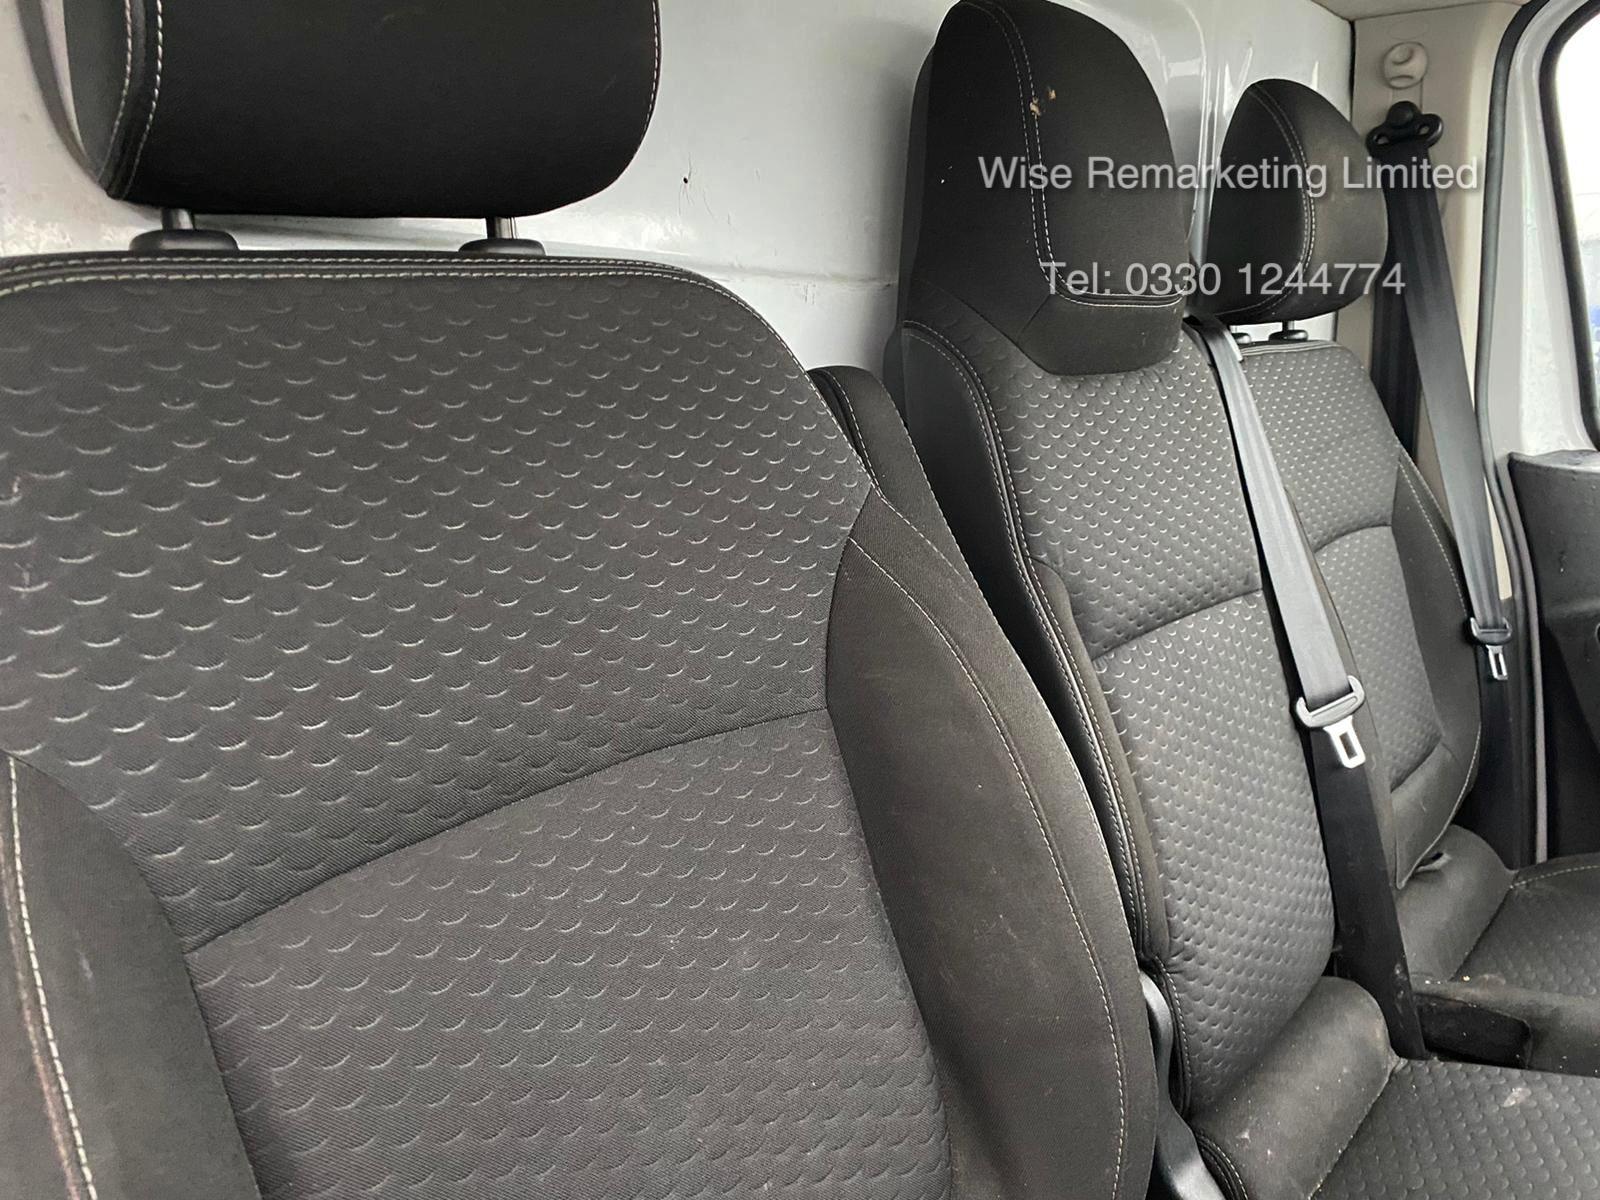 Vauxhall Vivaro 2700 Sportive 1.6 CDTI - 2017 Reg - Parking Sensors - Air Con - - Image 8 of 11